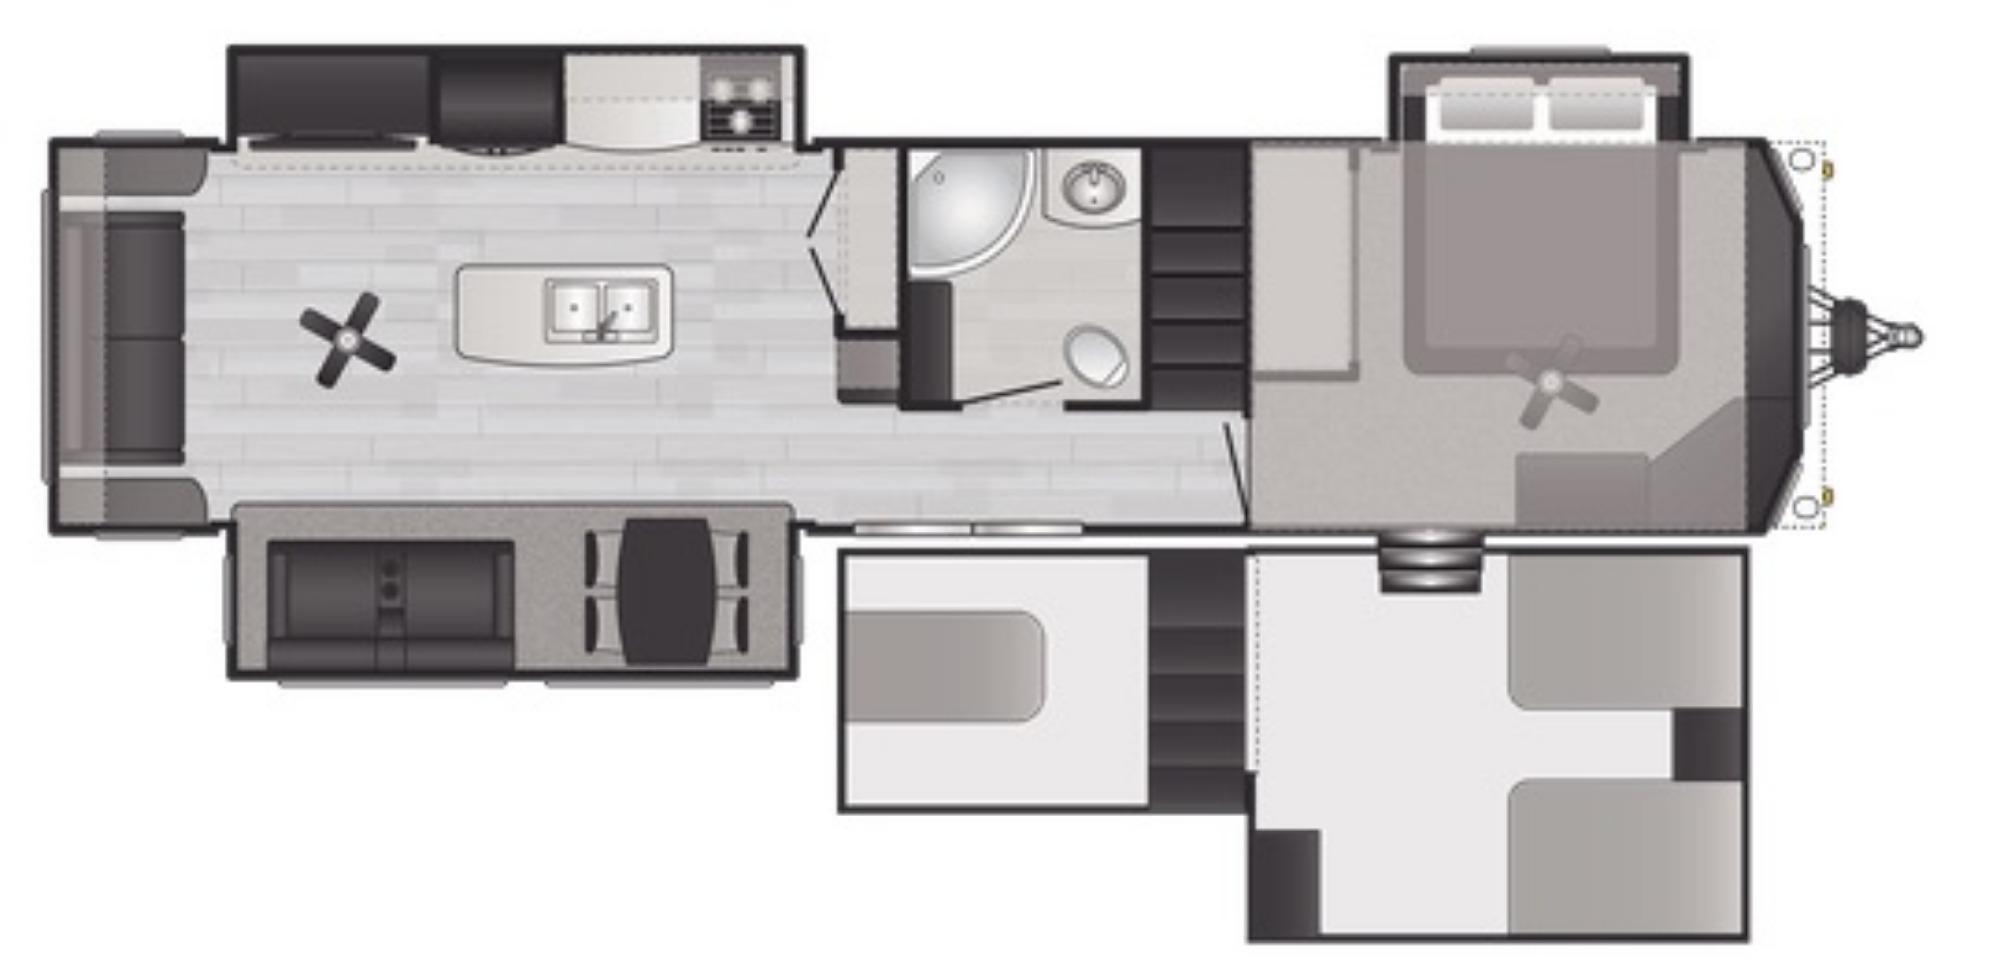 View Floor Plan for 2021 KEYSTONE RETREAT 39FLFT